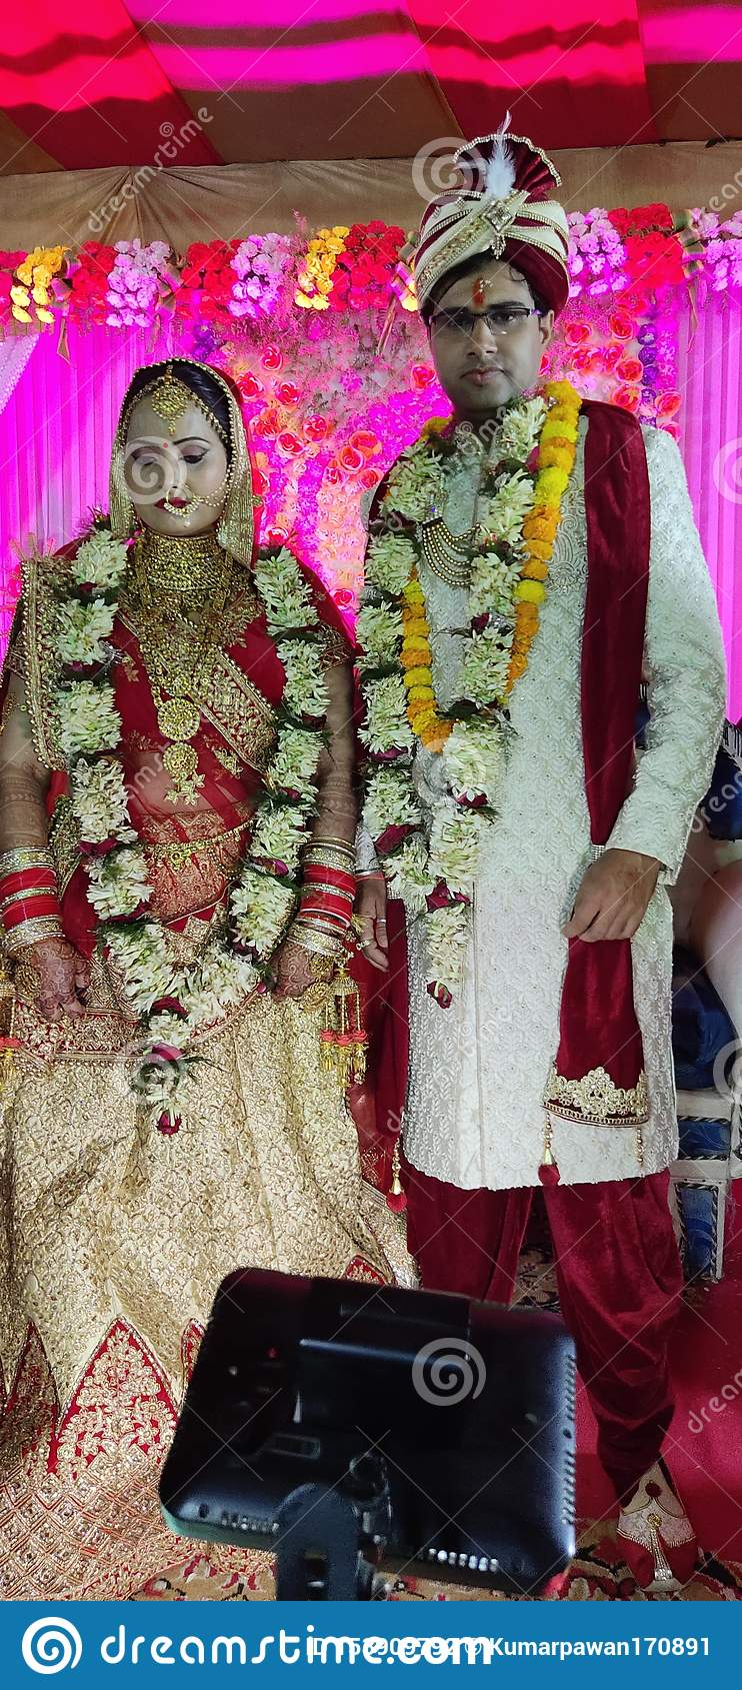 IMAGES DE MARIAGE, AMOUR, VARANASI, BEAU, INDIEN MARIAGE